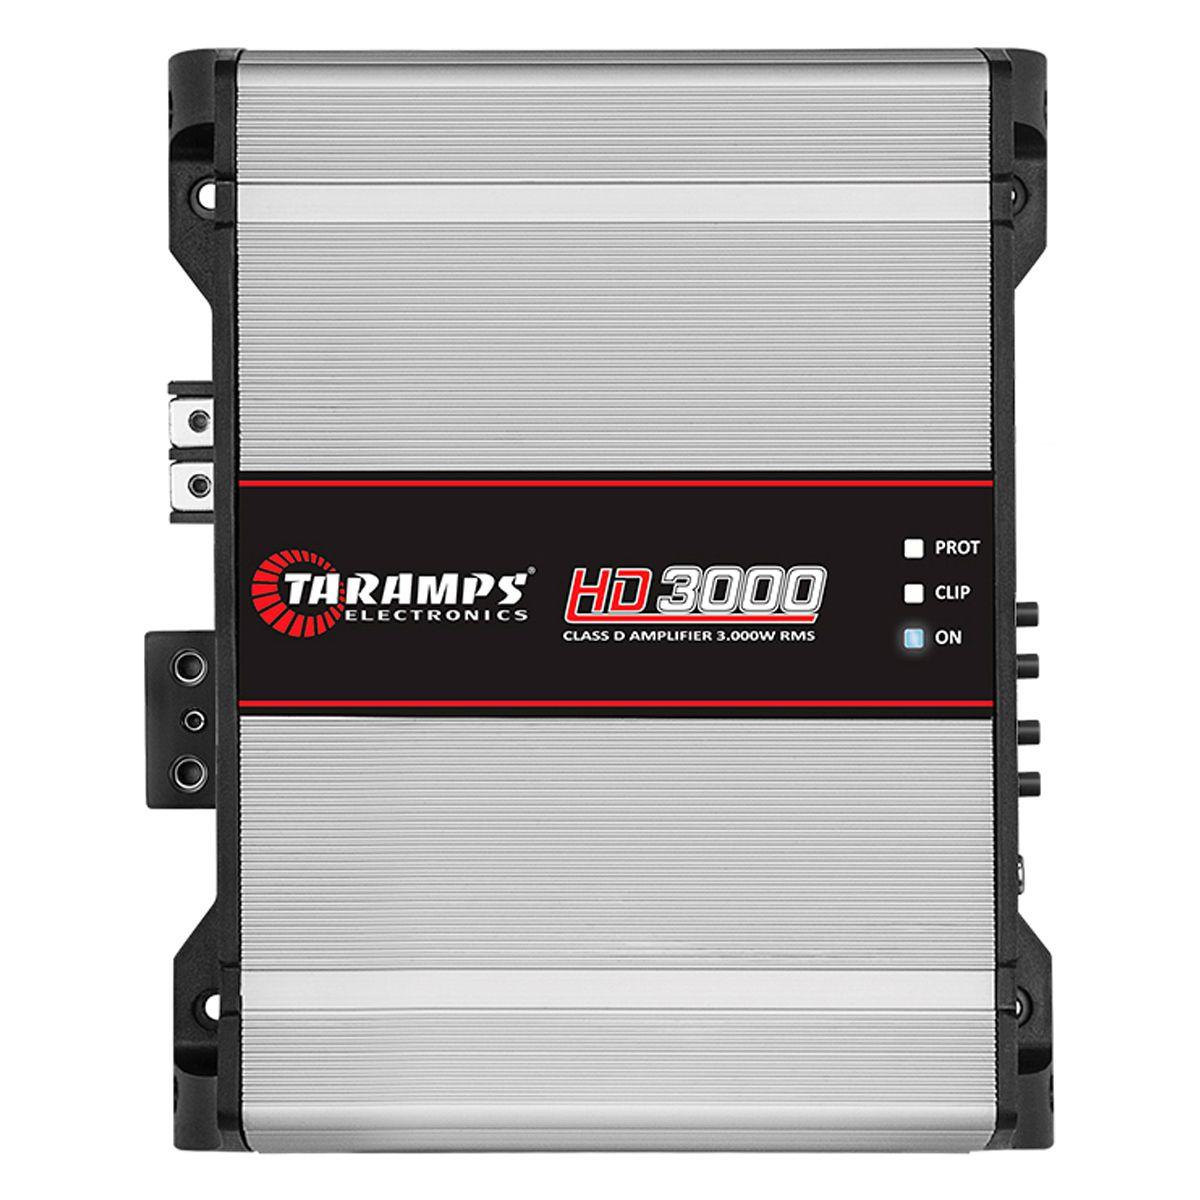 Módulo Amplificador HD 3000 2 Ohm Taramps 3000w Rms 1 Canal